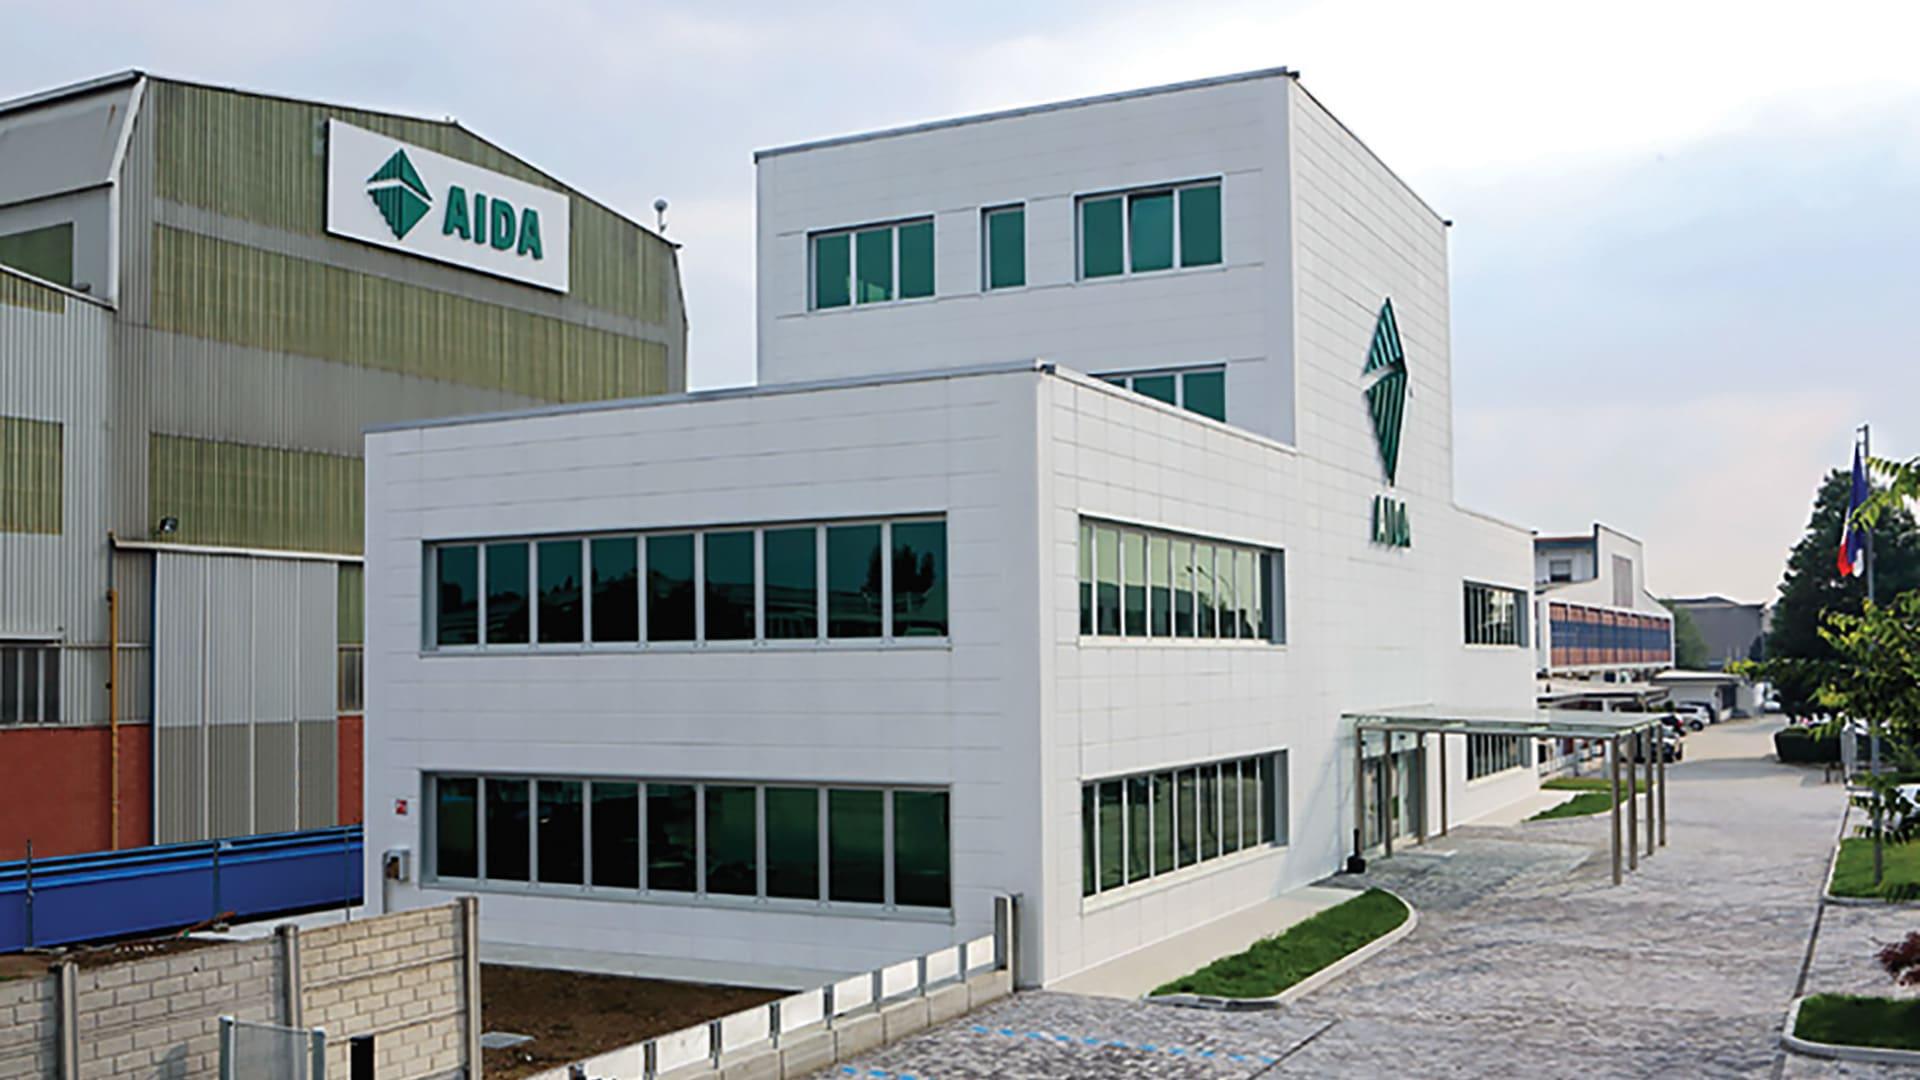 AIDA S.r.l., Brescia, Italy, AIDA's European Manufacturing Base